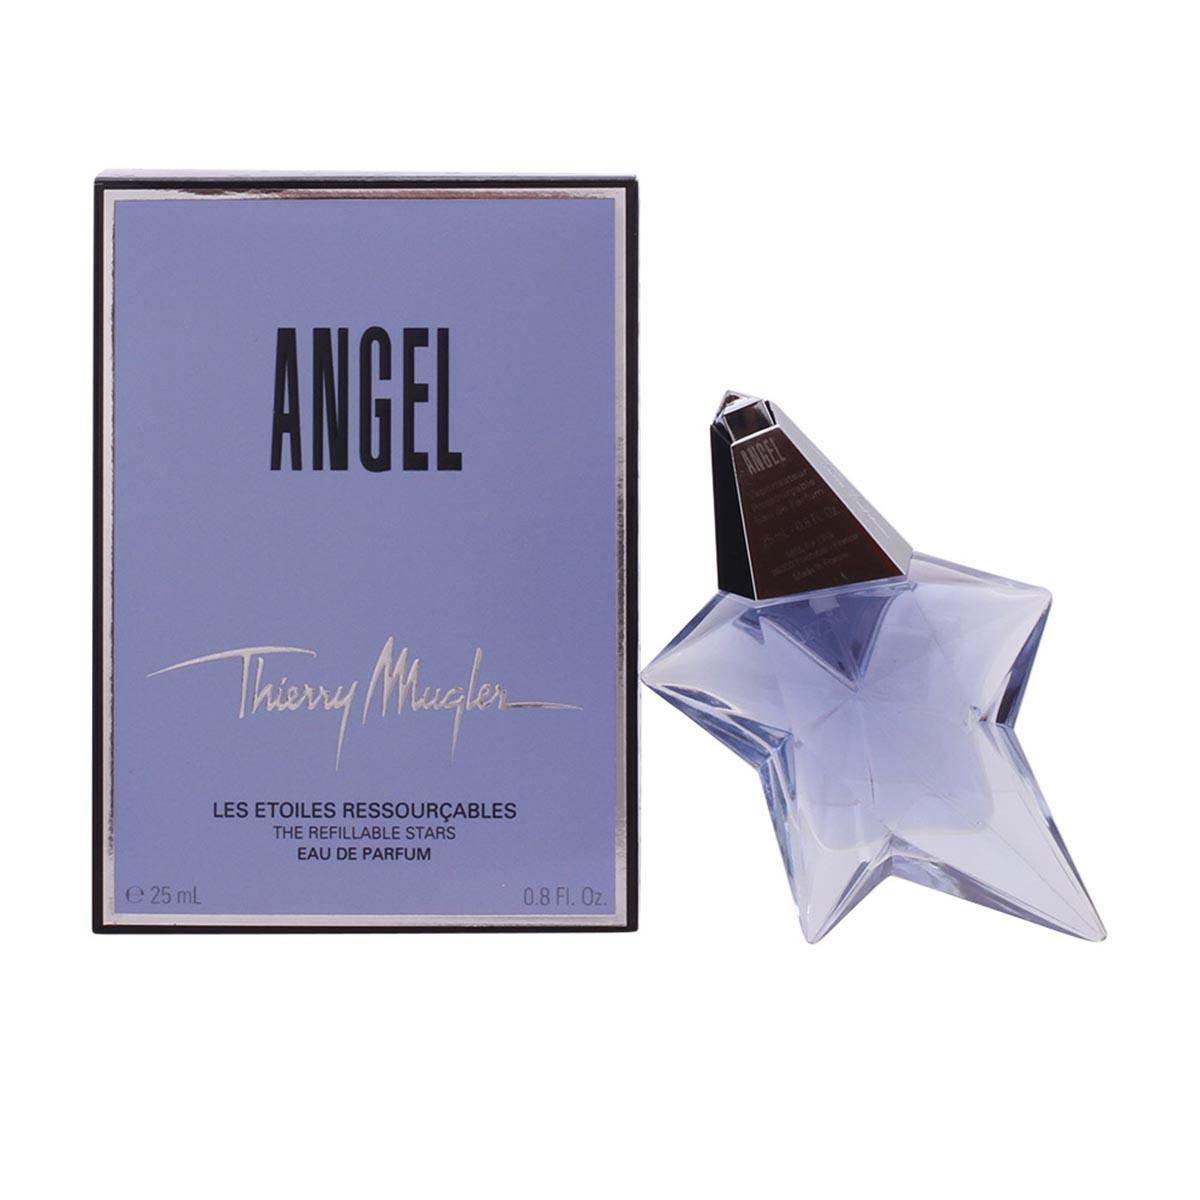 Thierry mugler angel eau de parfum rellenable 25ml vaporizador - BellezaMagica.com